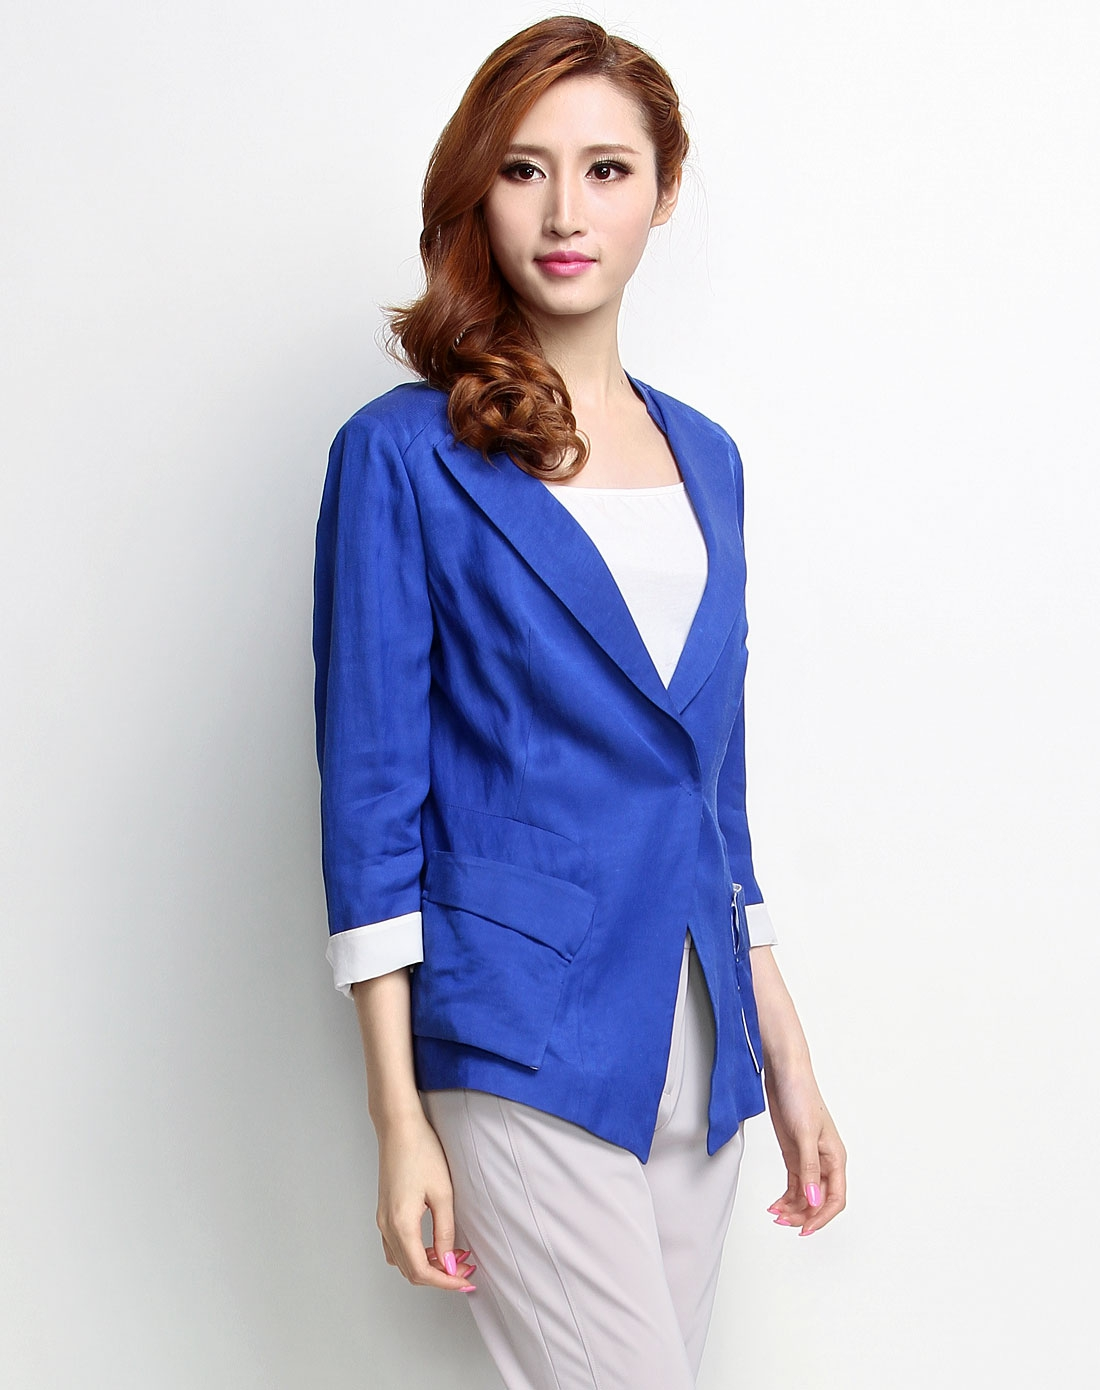 femelle时尚蓝色中袖休闲西服32as00305